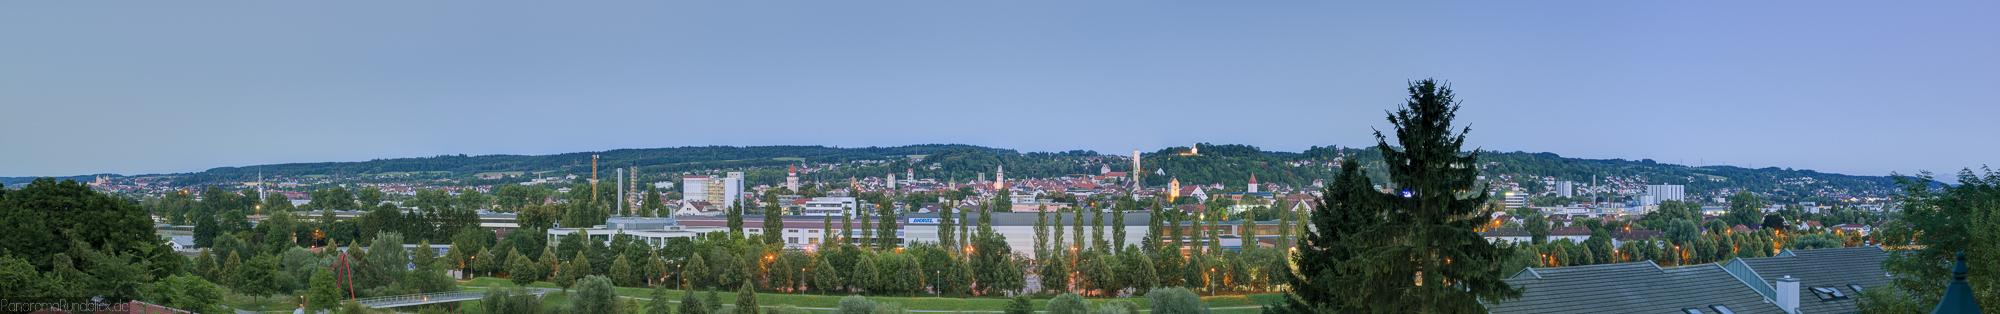 Blaue Stunde Ravensburg